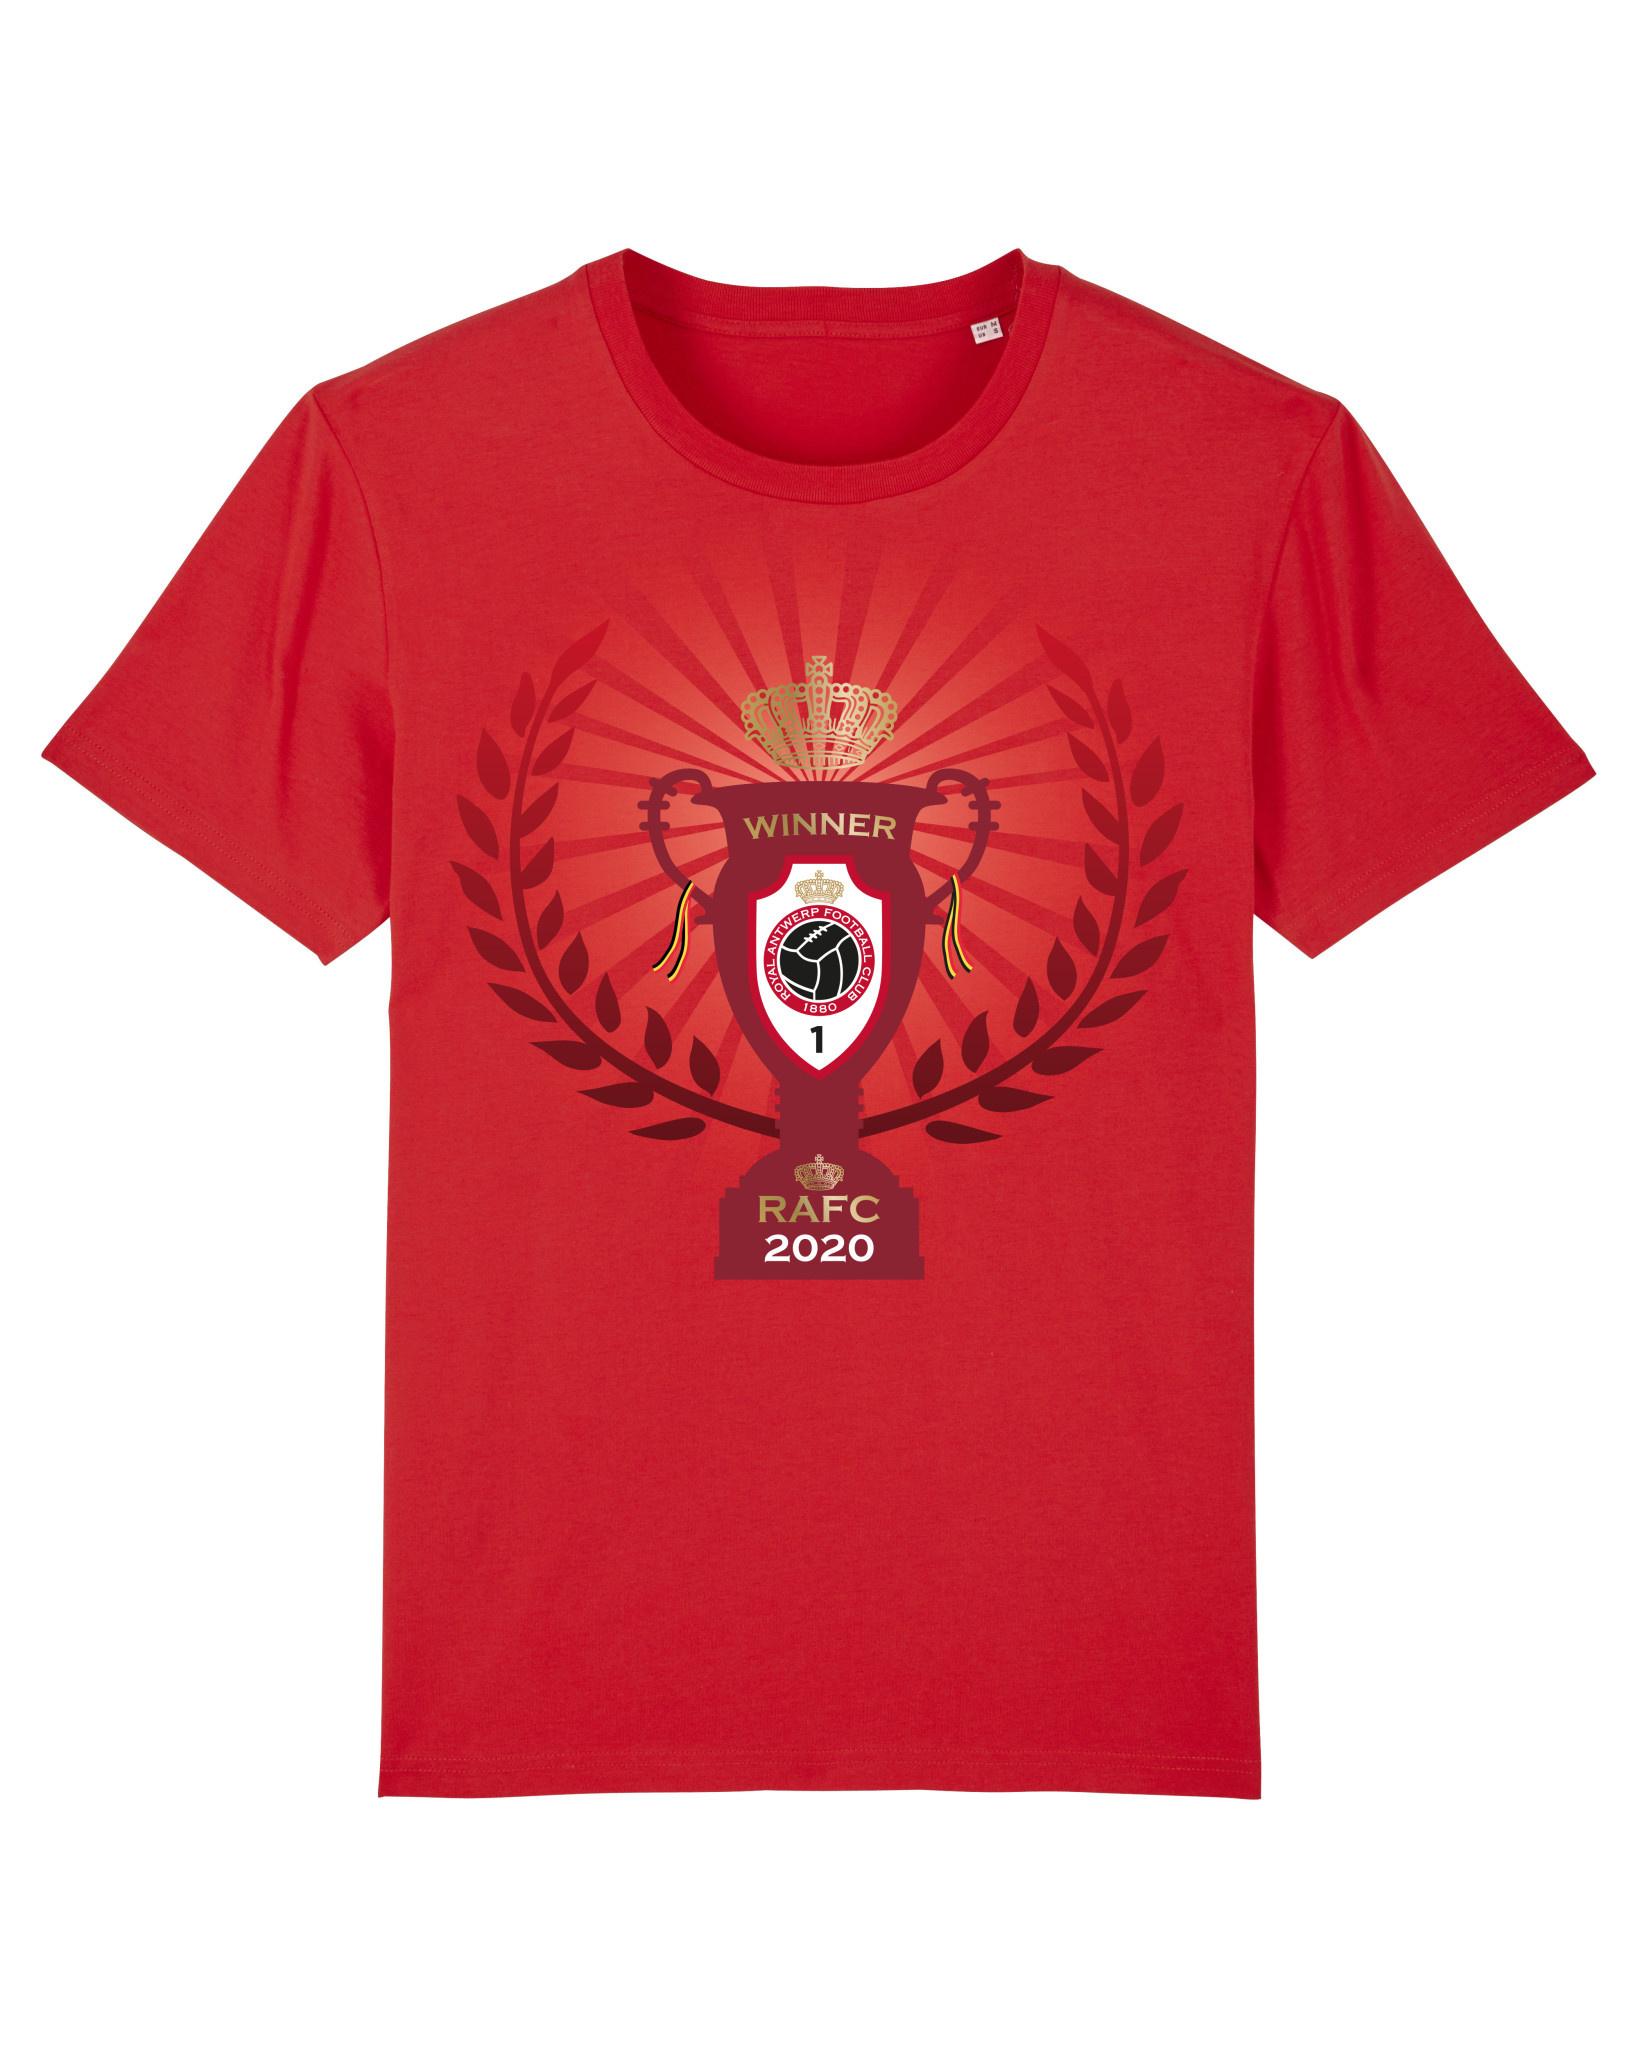 RAFC T-shirt Cup Winner 2020-1